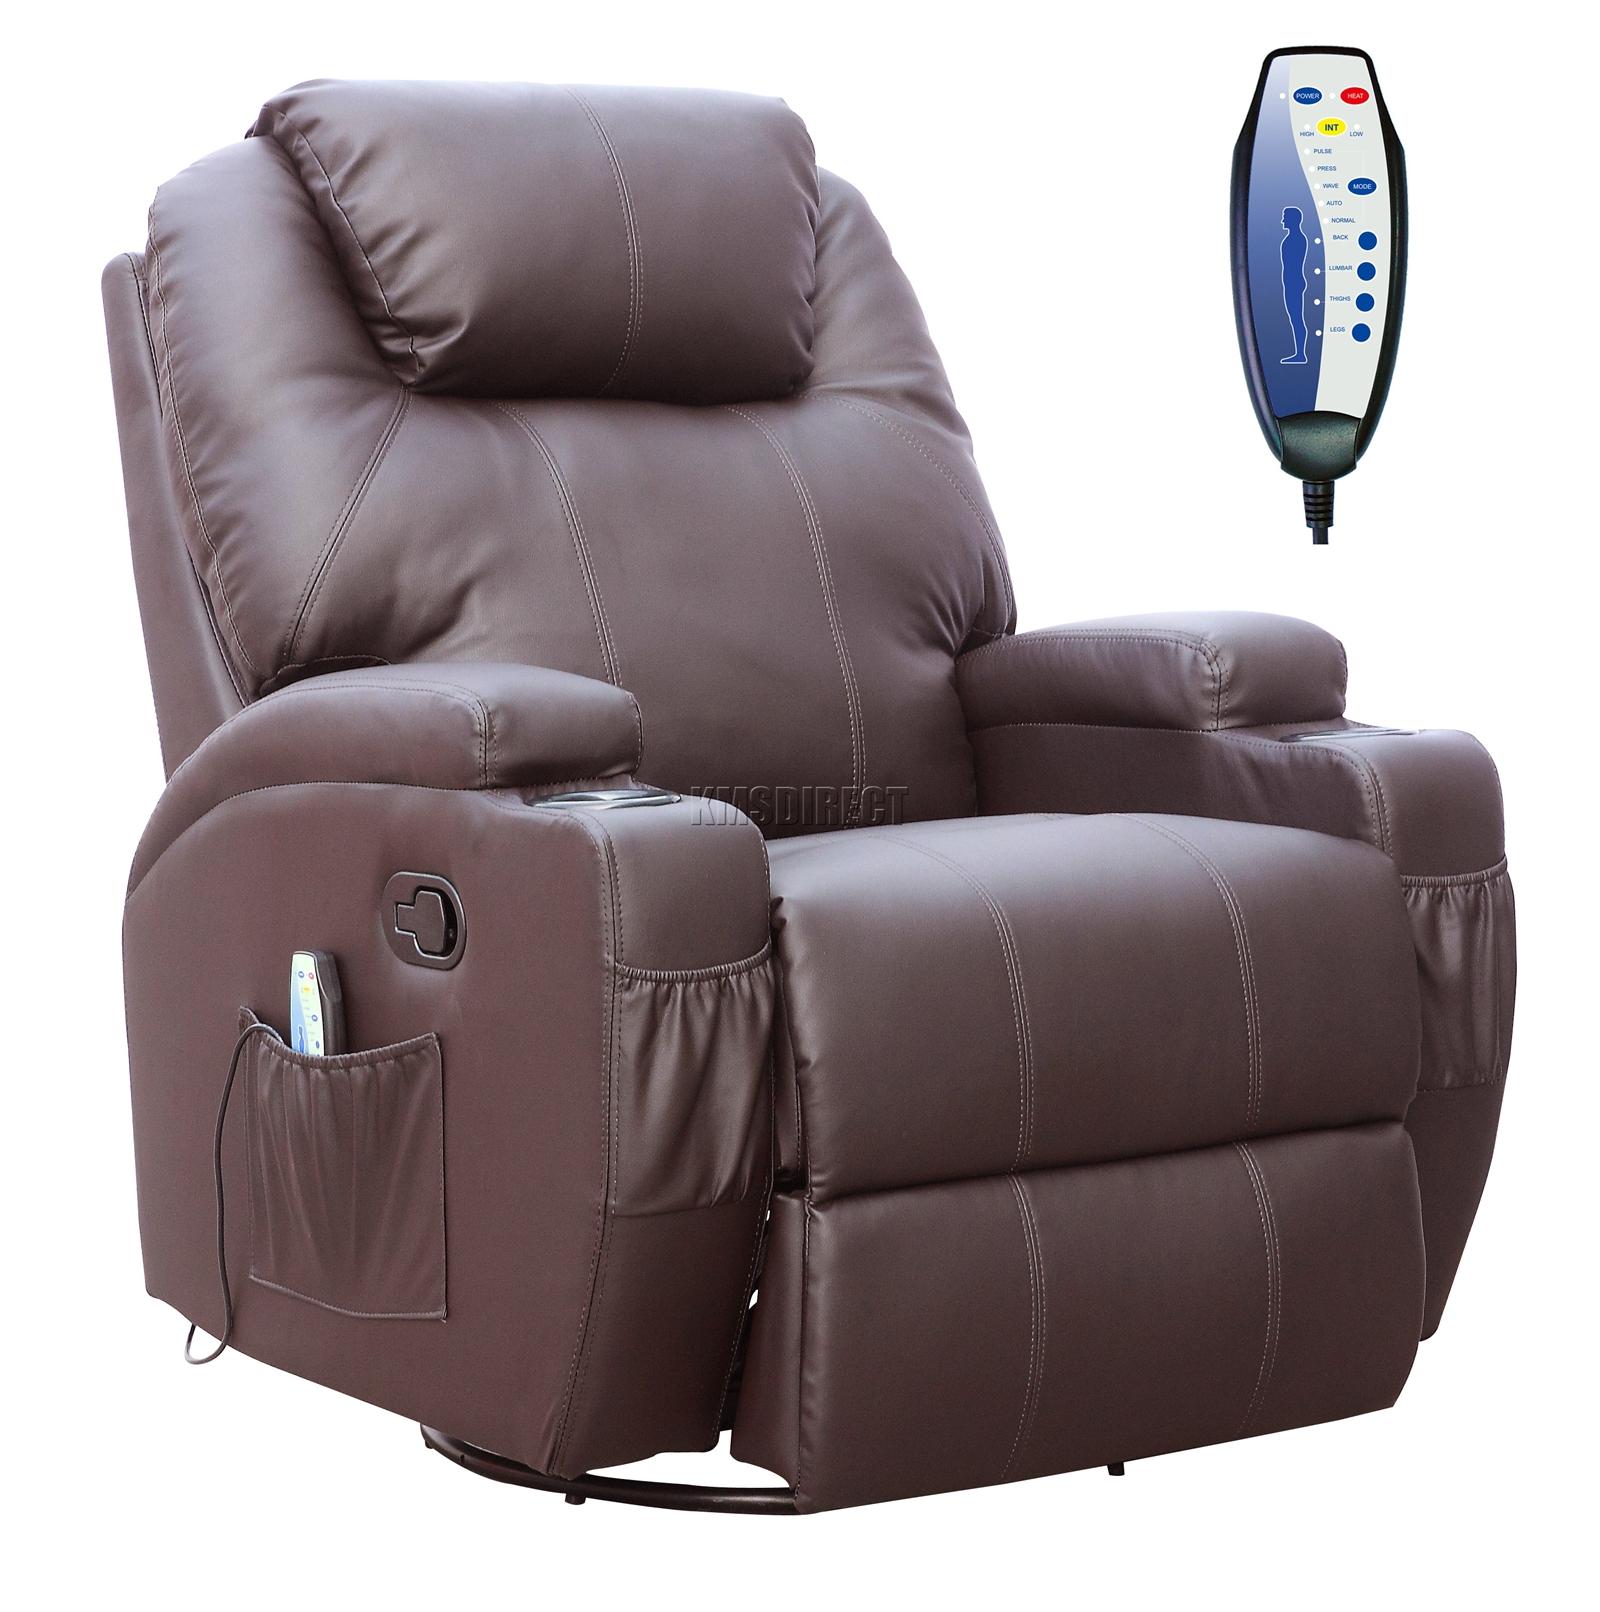 Rocking Sofa Rocking Sofa Chair Supplieranufacturers TheSofa